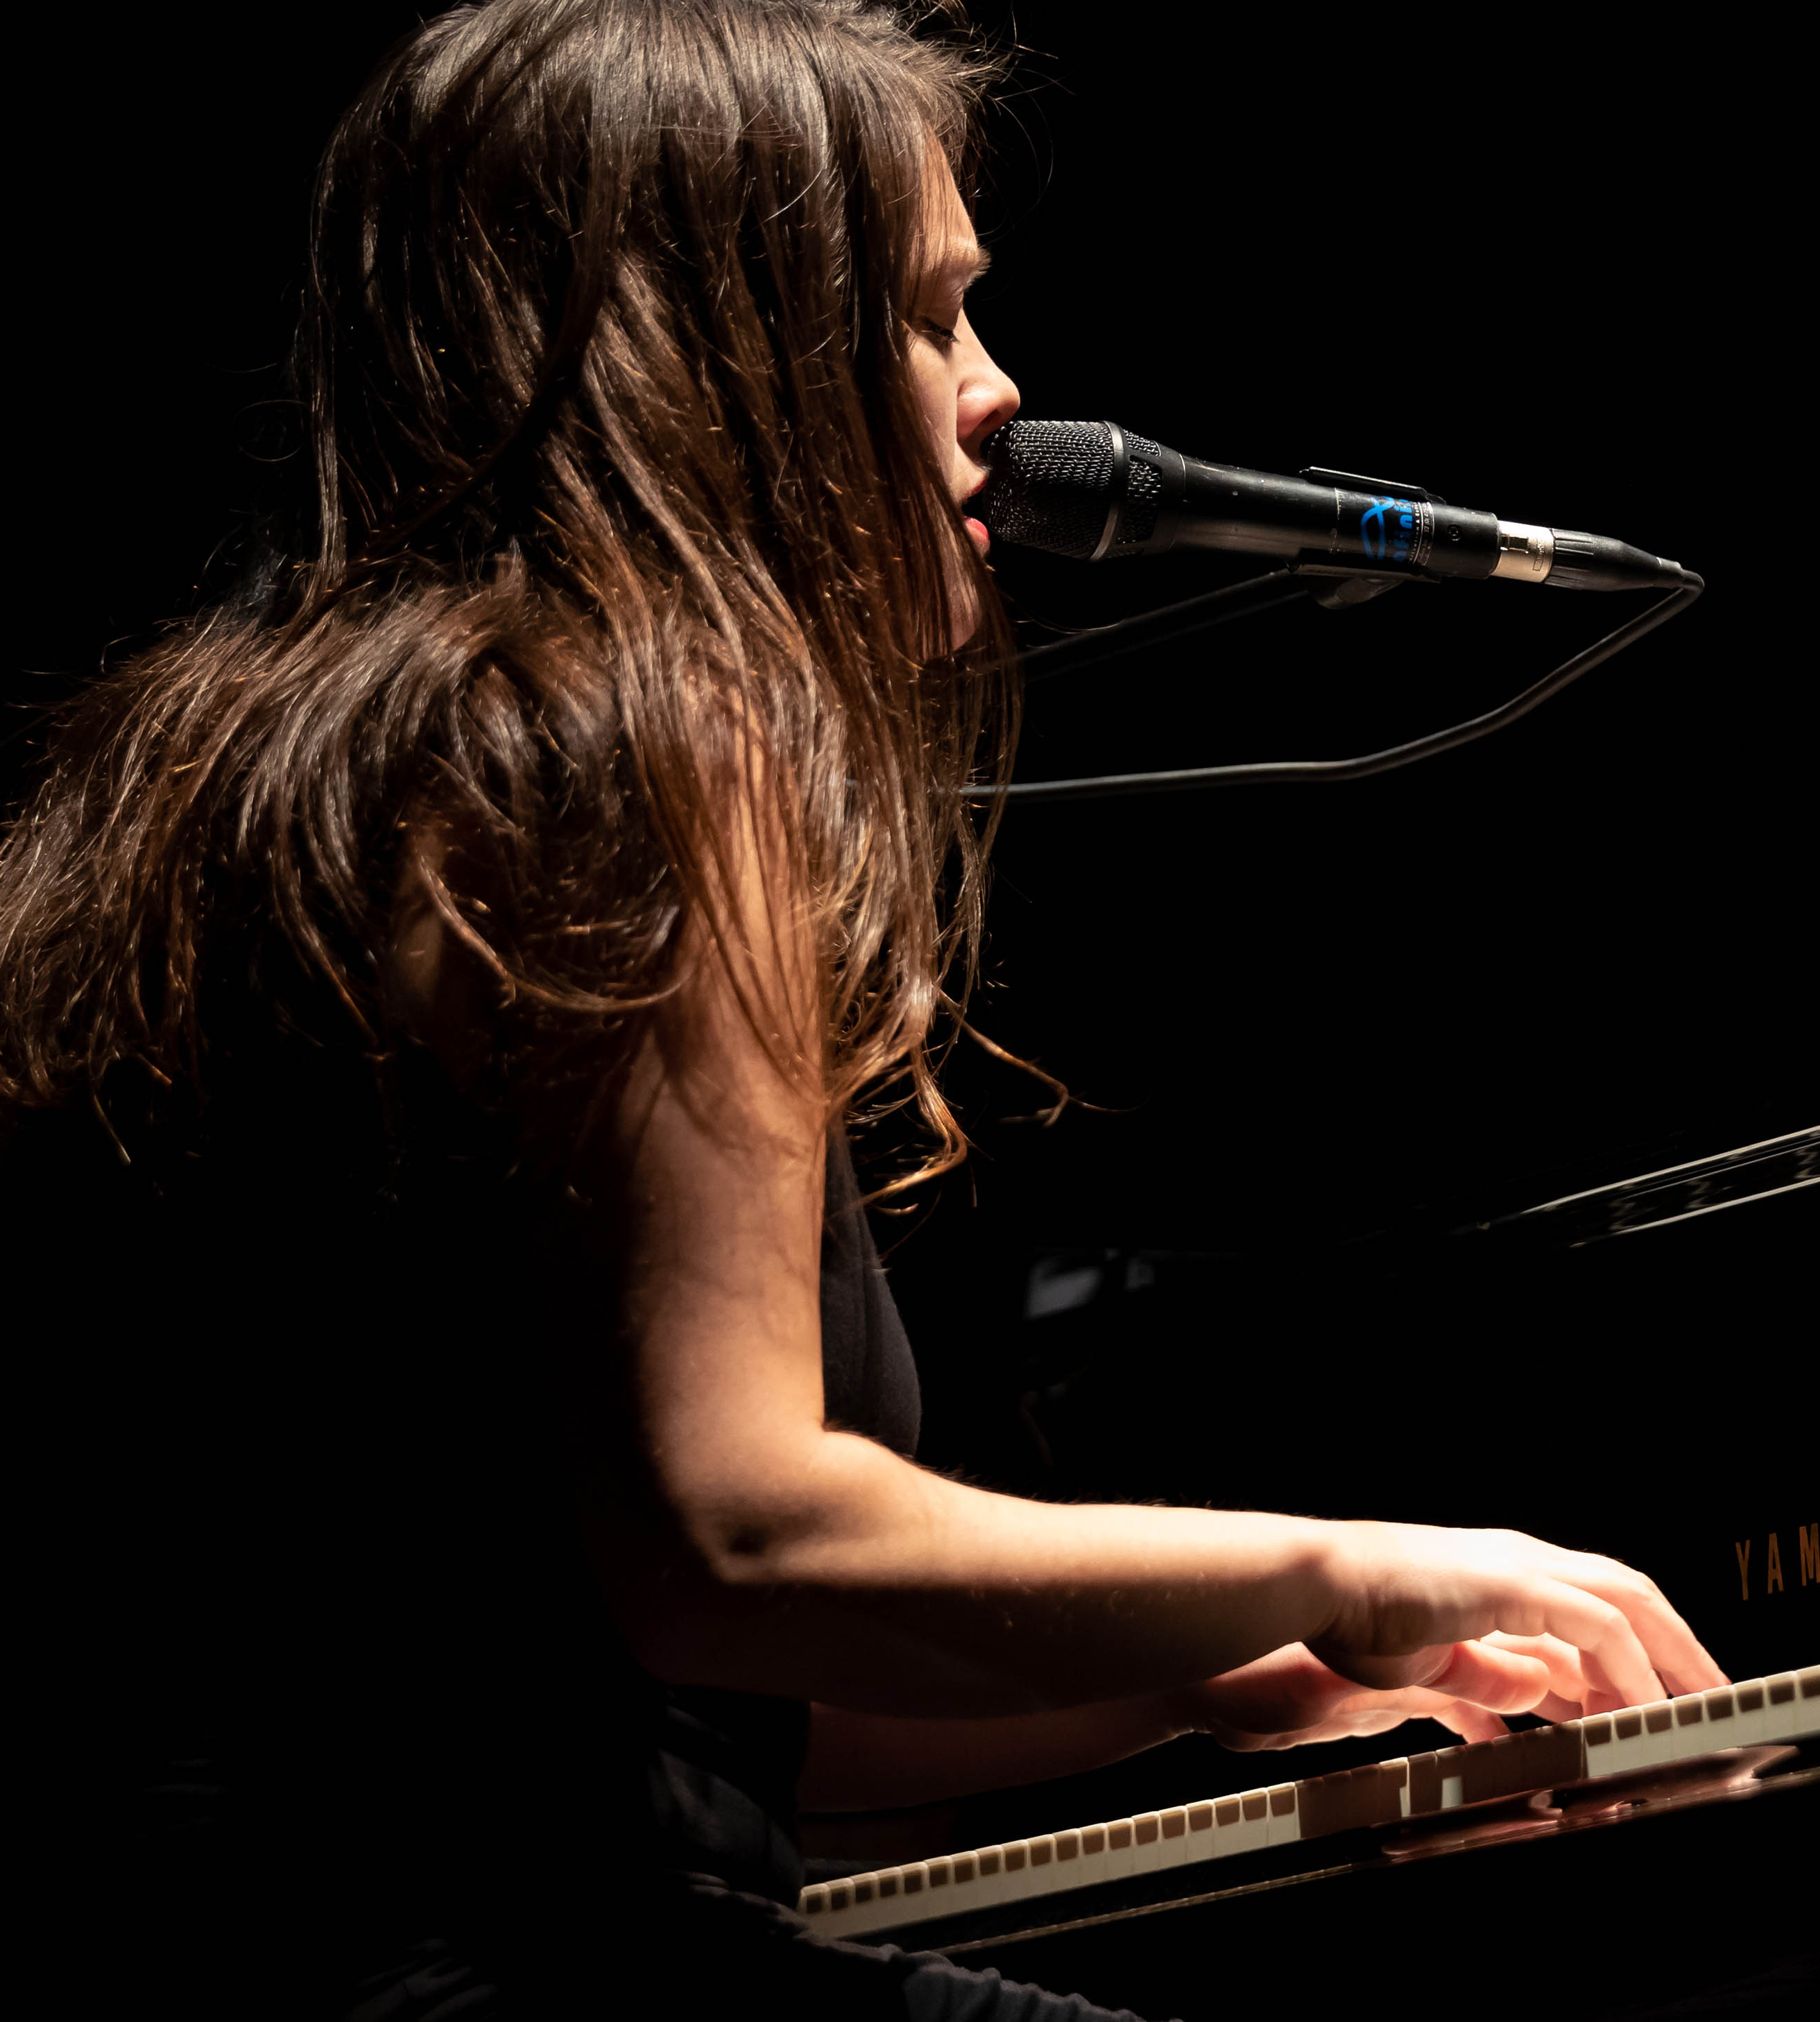 Mathilde Renault - chanteuse et pianiste belge - KAO MAG